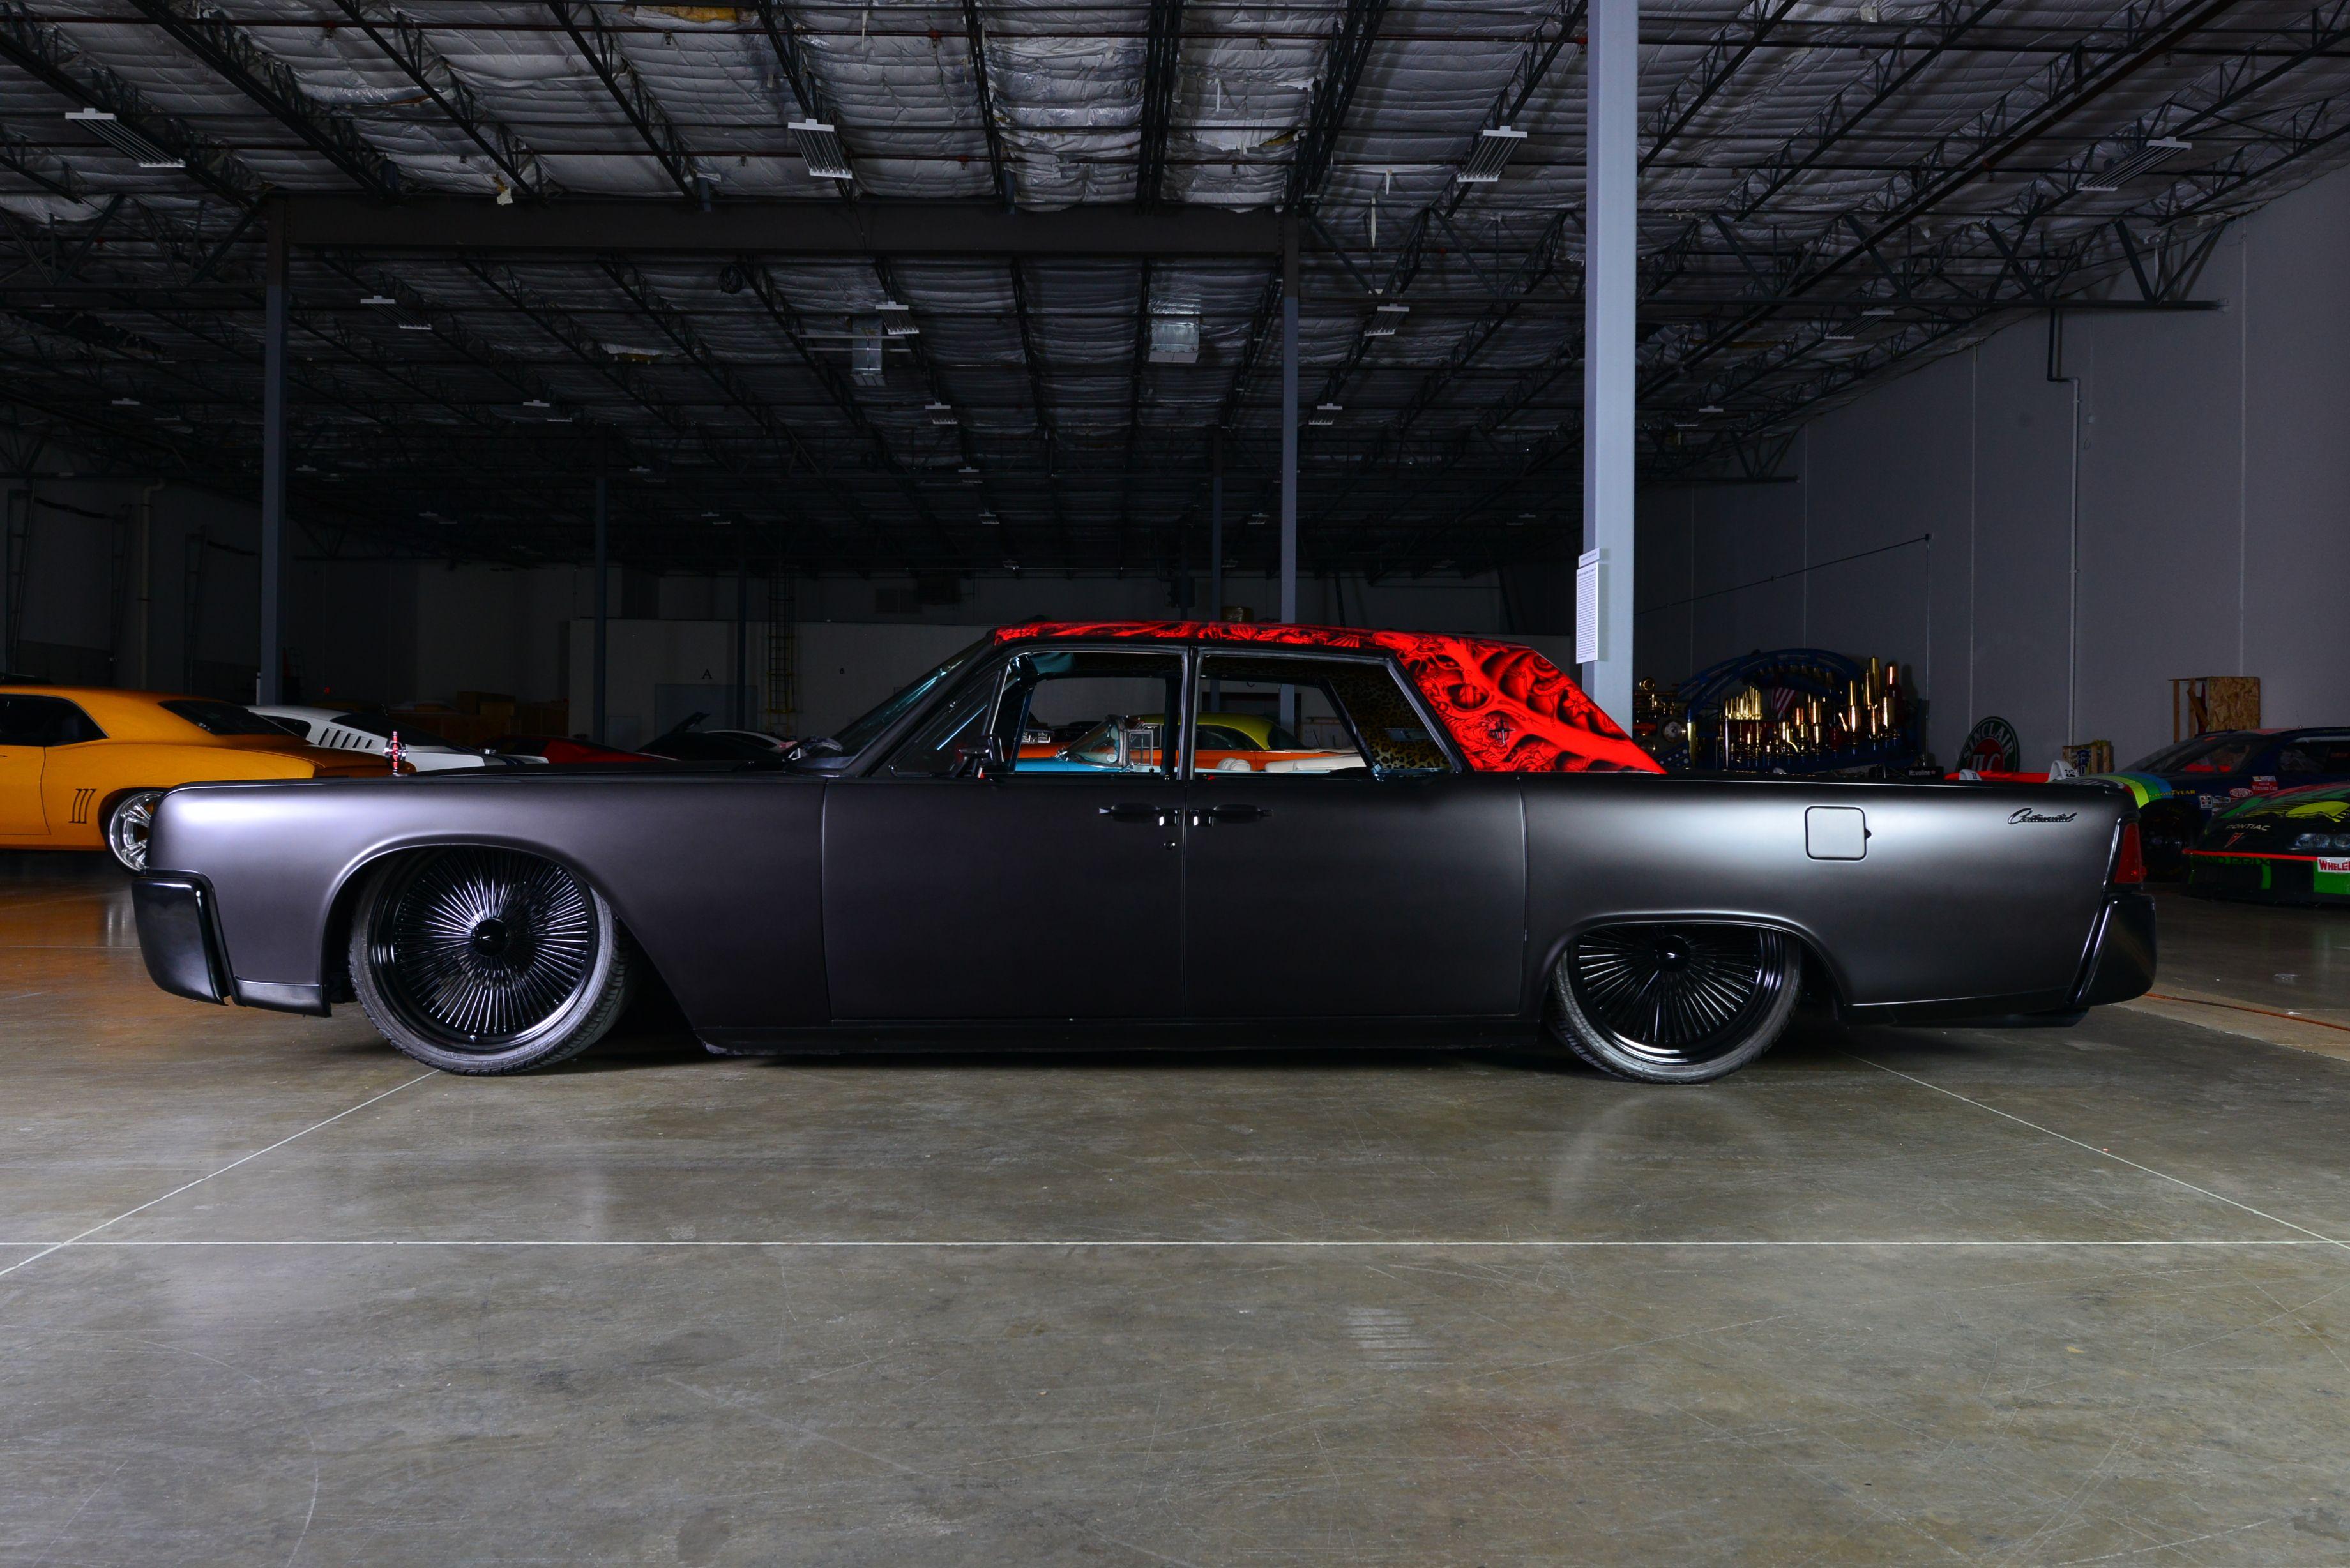 1964 Lincoln Continental Lowrider | AutoTrader Classics - 1964 ...